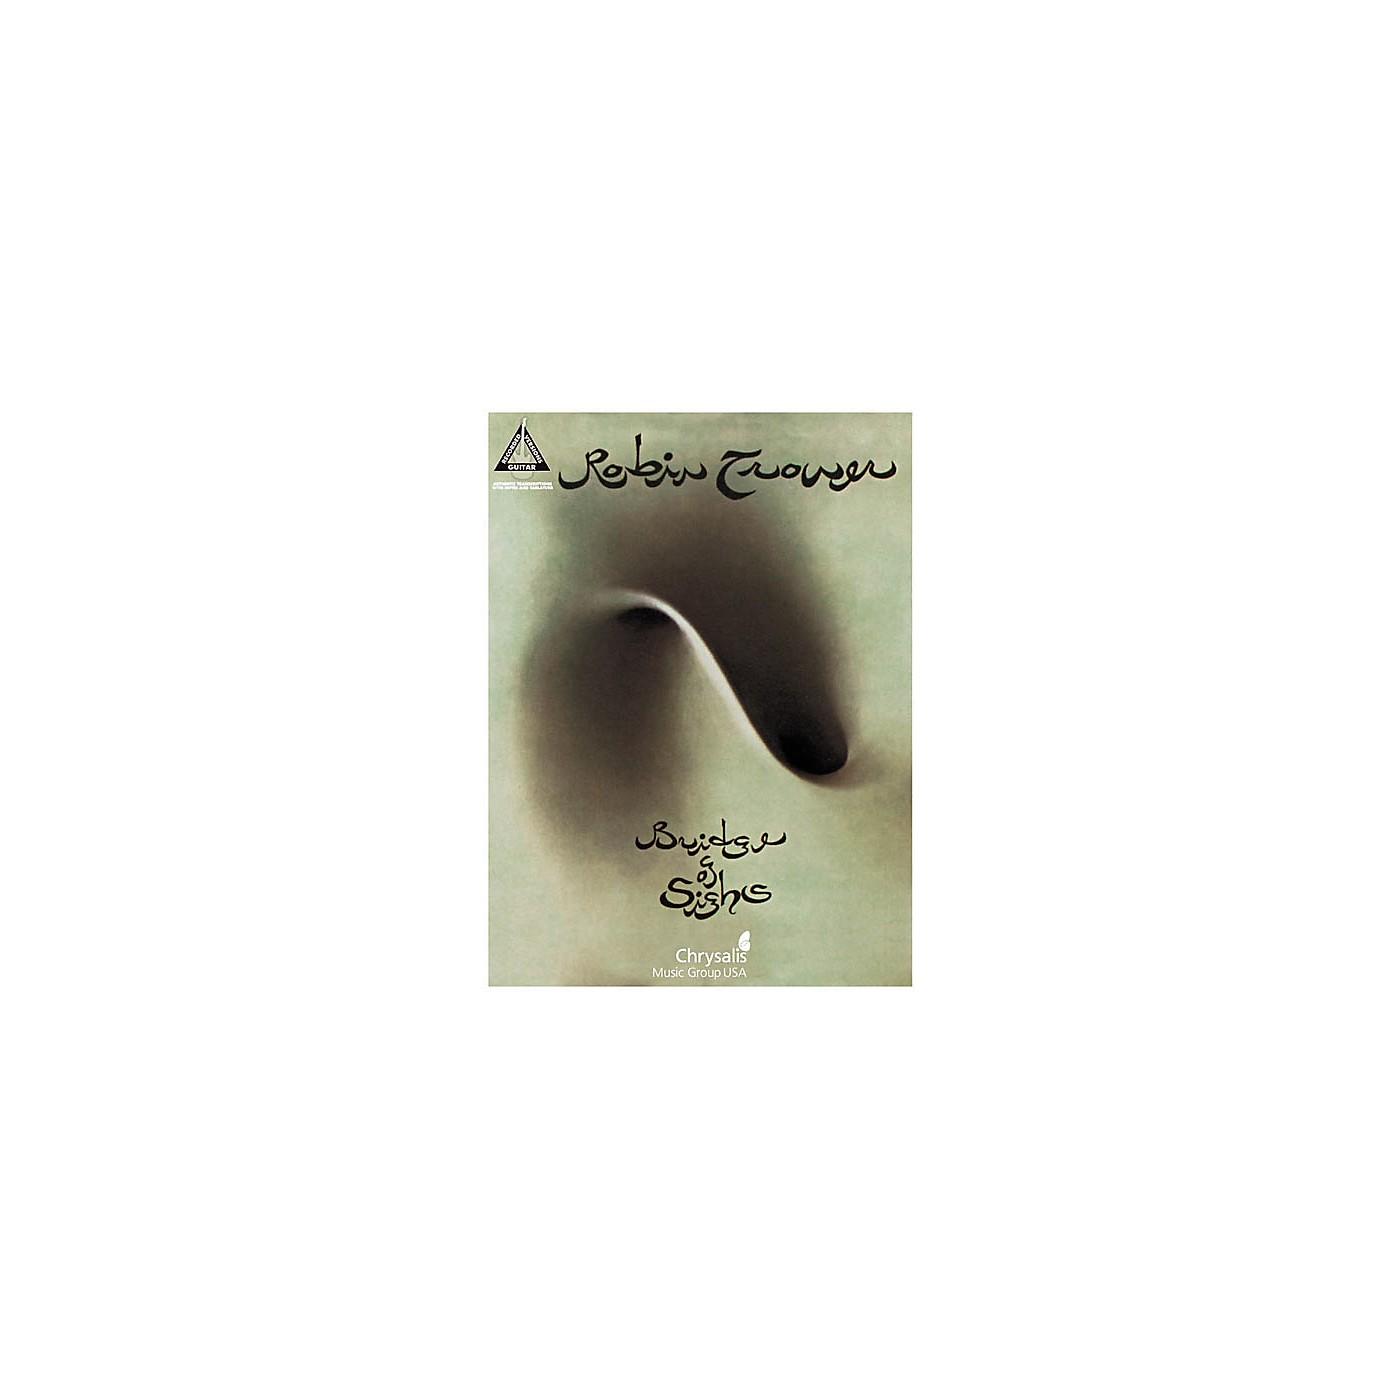 Hal Leonard Robin Trower Bridge of Sighs Guitar Tab Songbook thumbnail